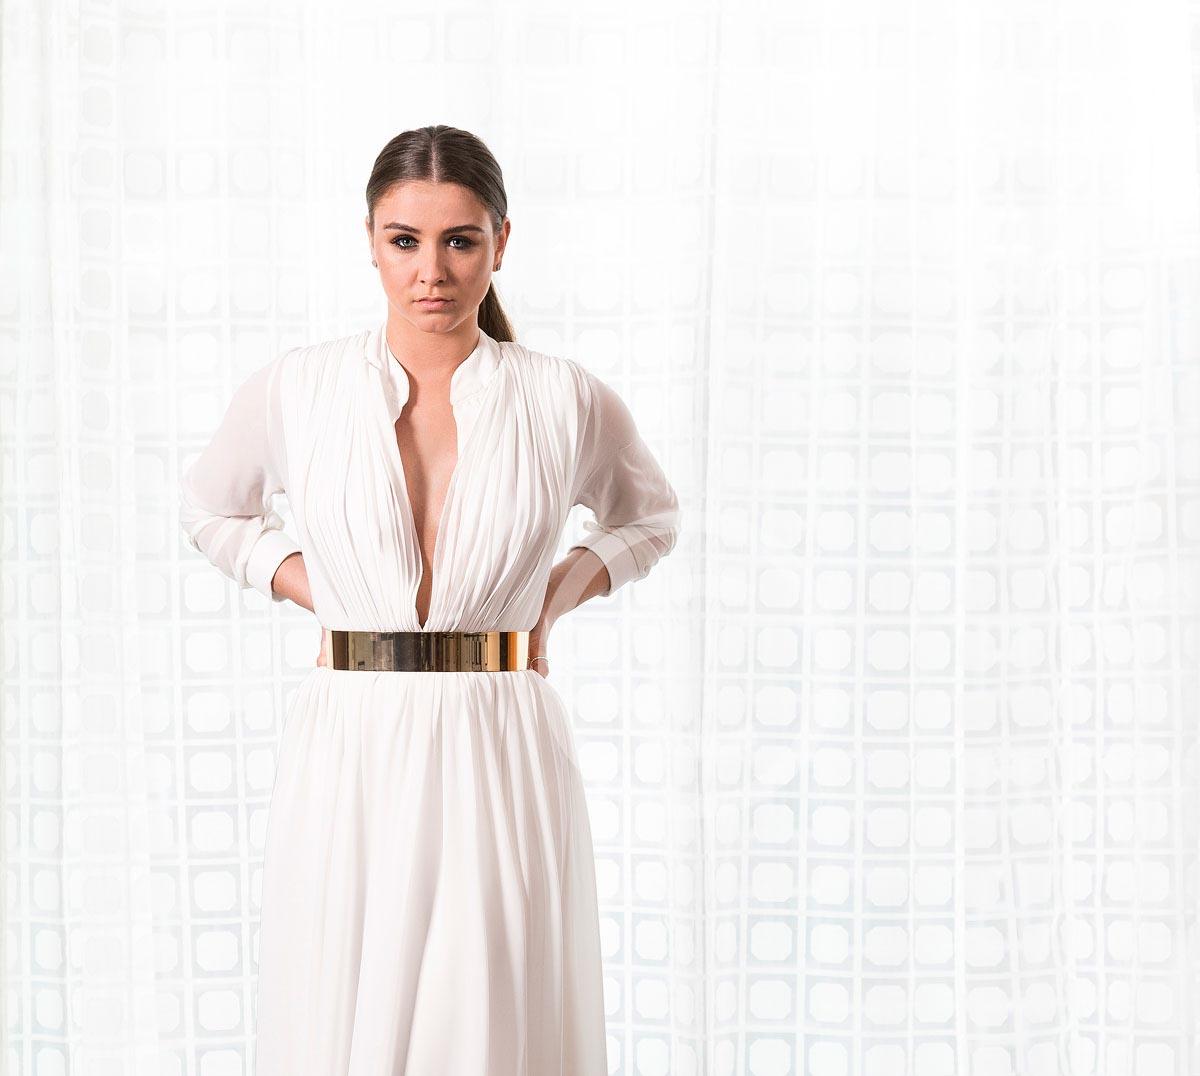 brookvincent-celebrity-photography-manchester-fashion-smag-editorial-magazine-9291